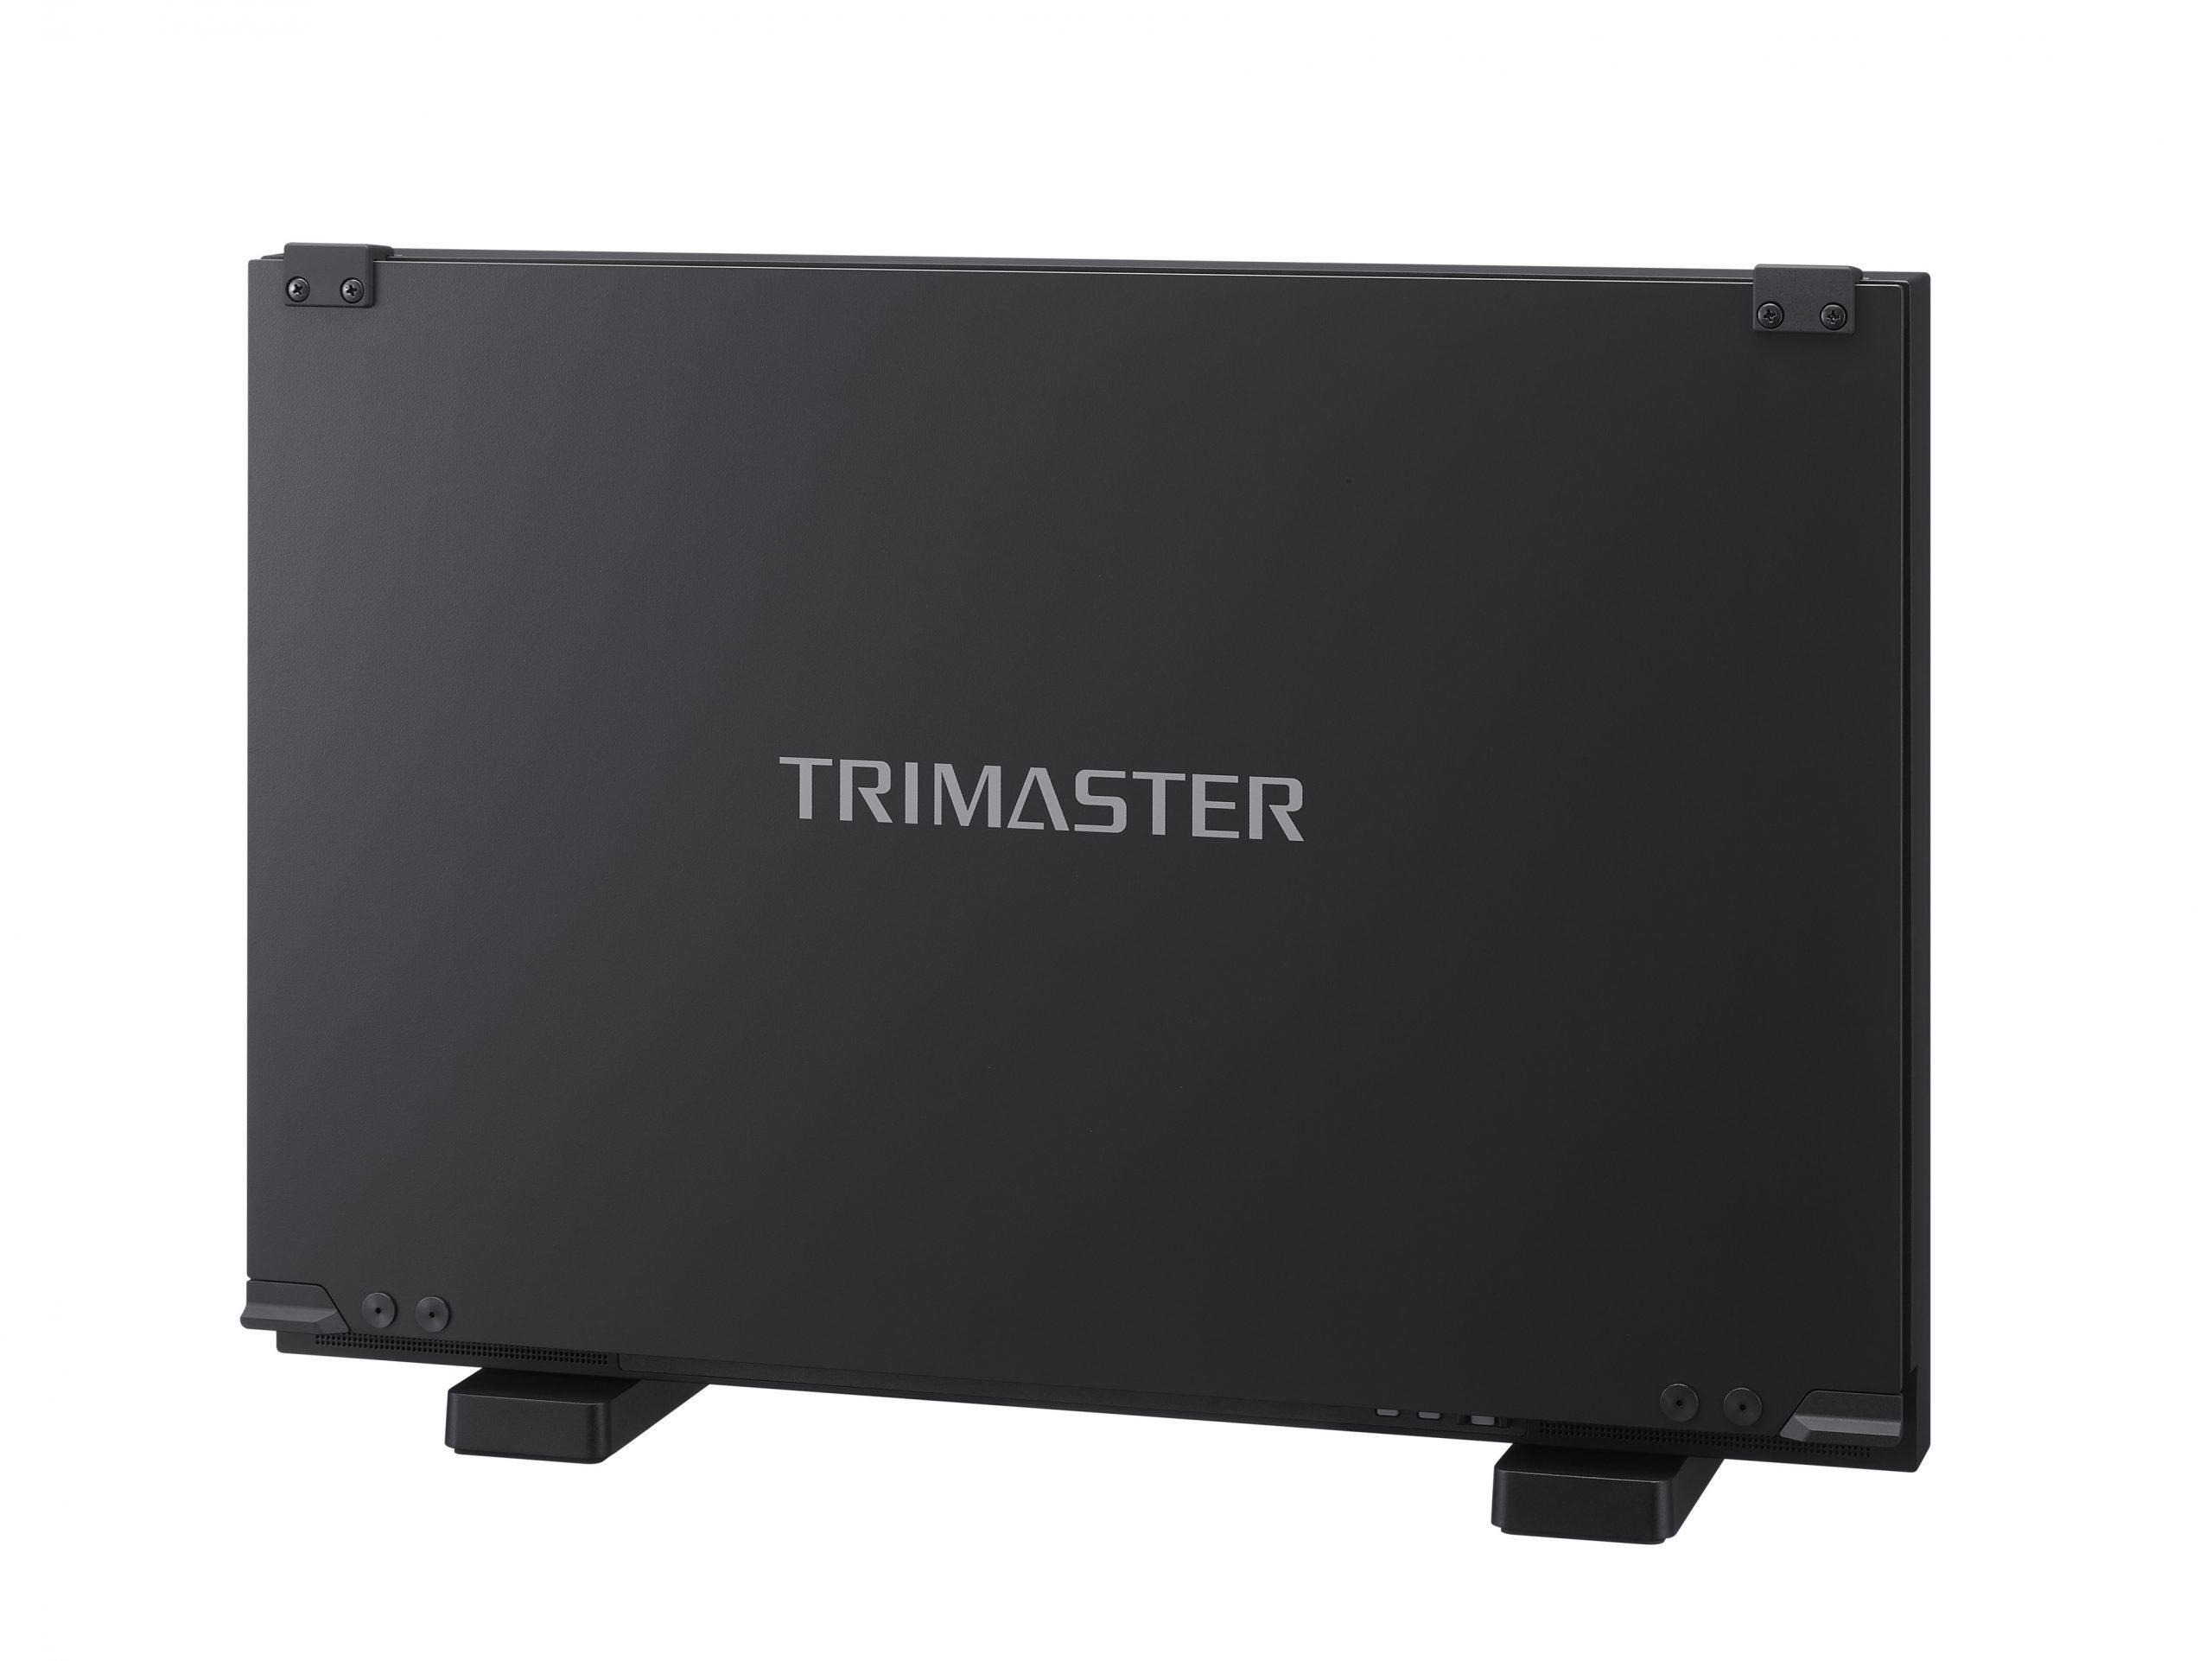 Sony Trimaster PMV X2400 4K HD Tapado